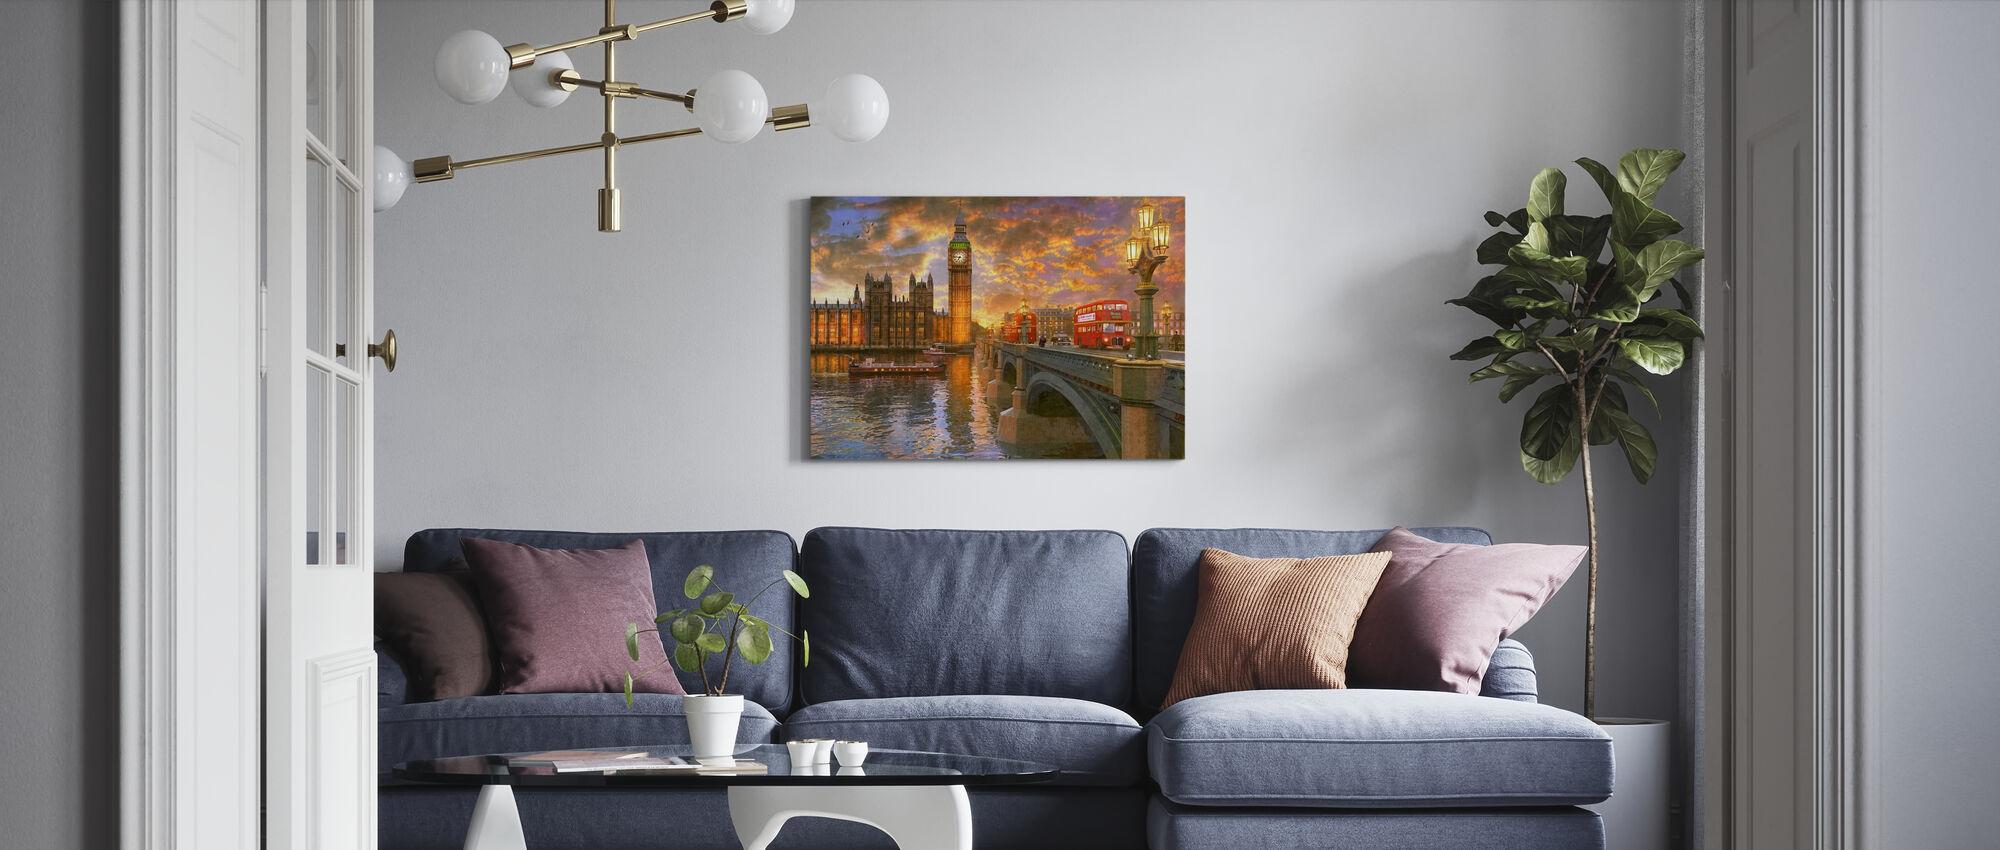 Westminster Sunset - Canvastavla - Vardagsrum